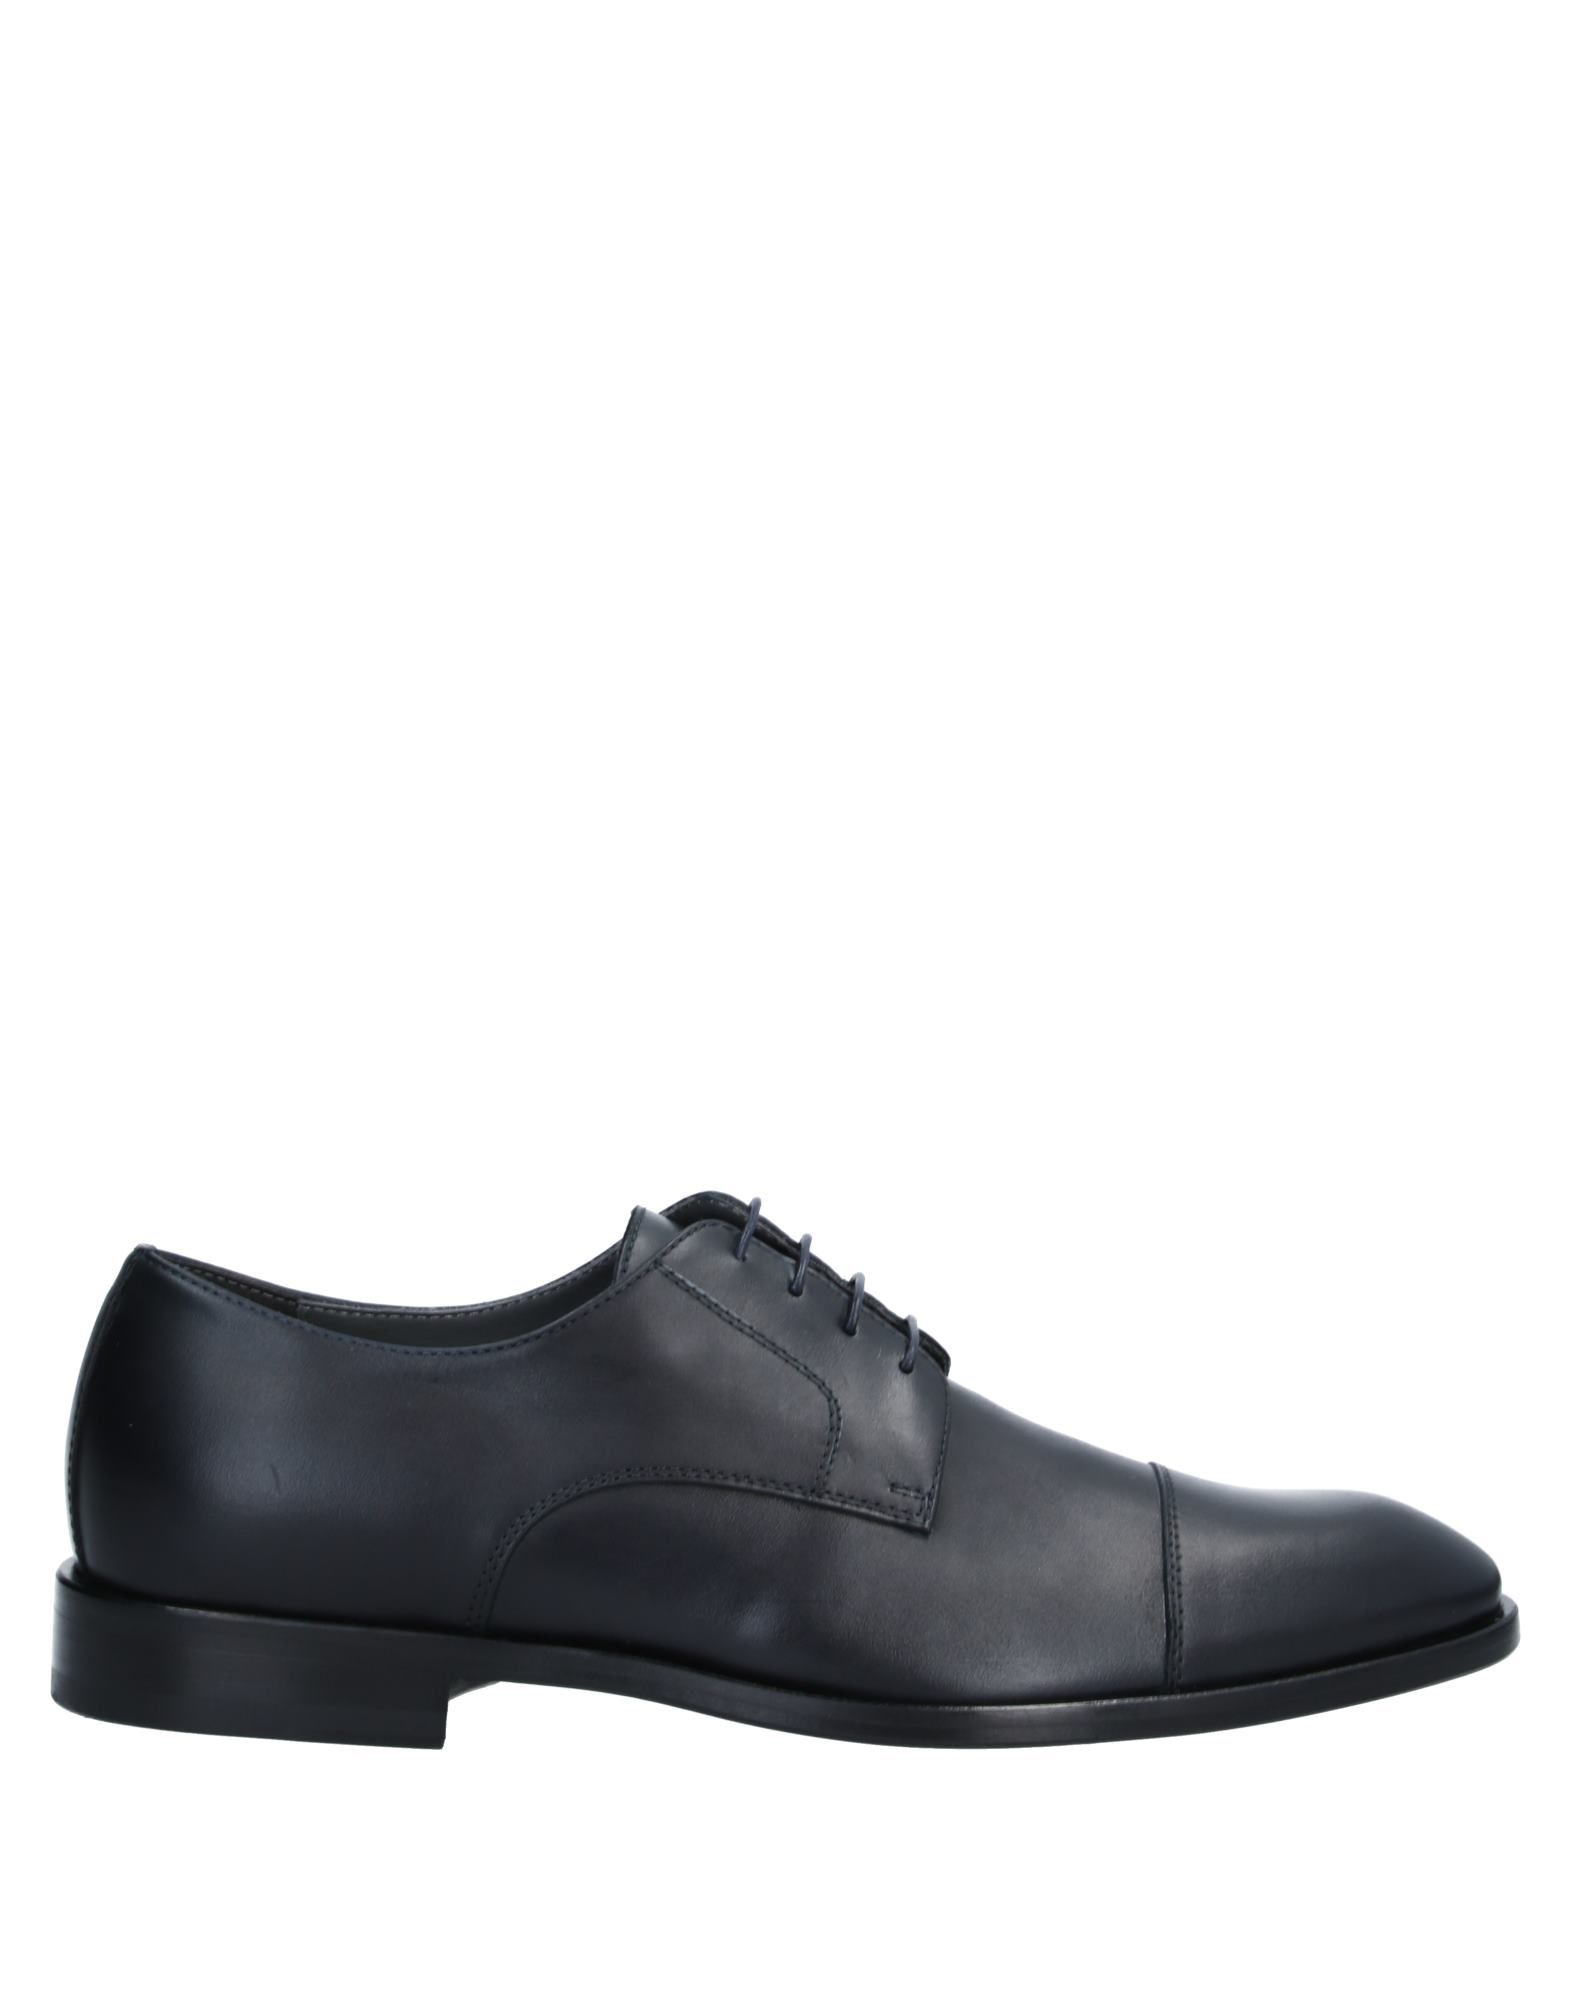 Chaussures À Lacets Alberto Guardiani Homme - Chaussures À Lacets Alberto Guardiani   - 11709550RF